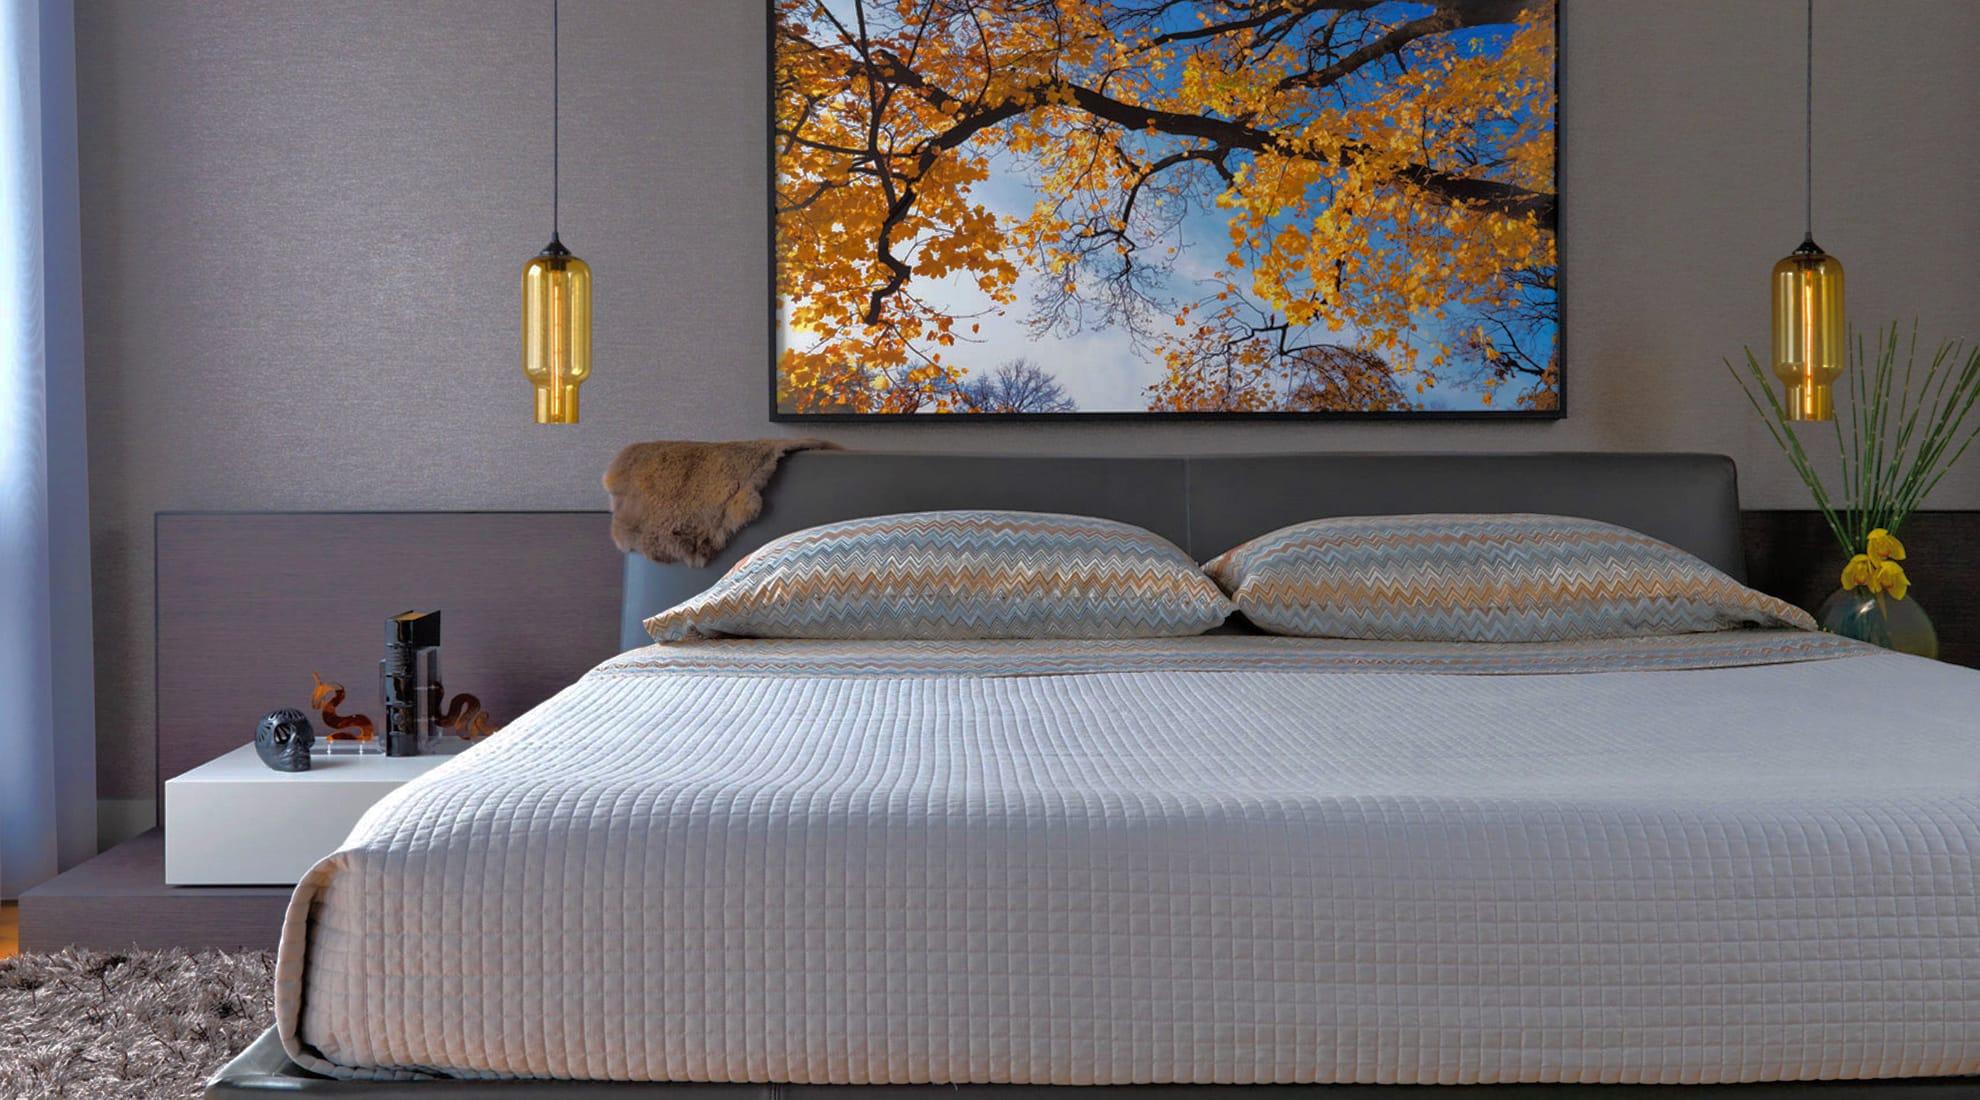 Bedside Pendant Light Ideas Nightstand Pendant Lighting At